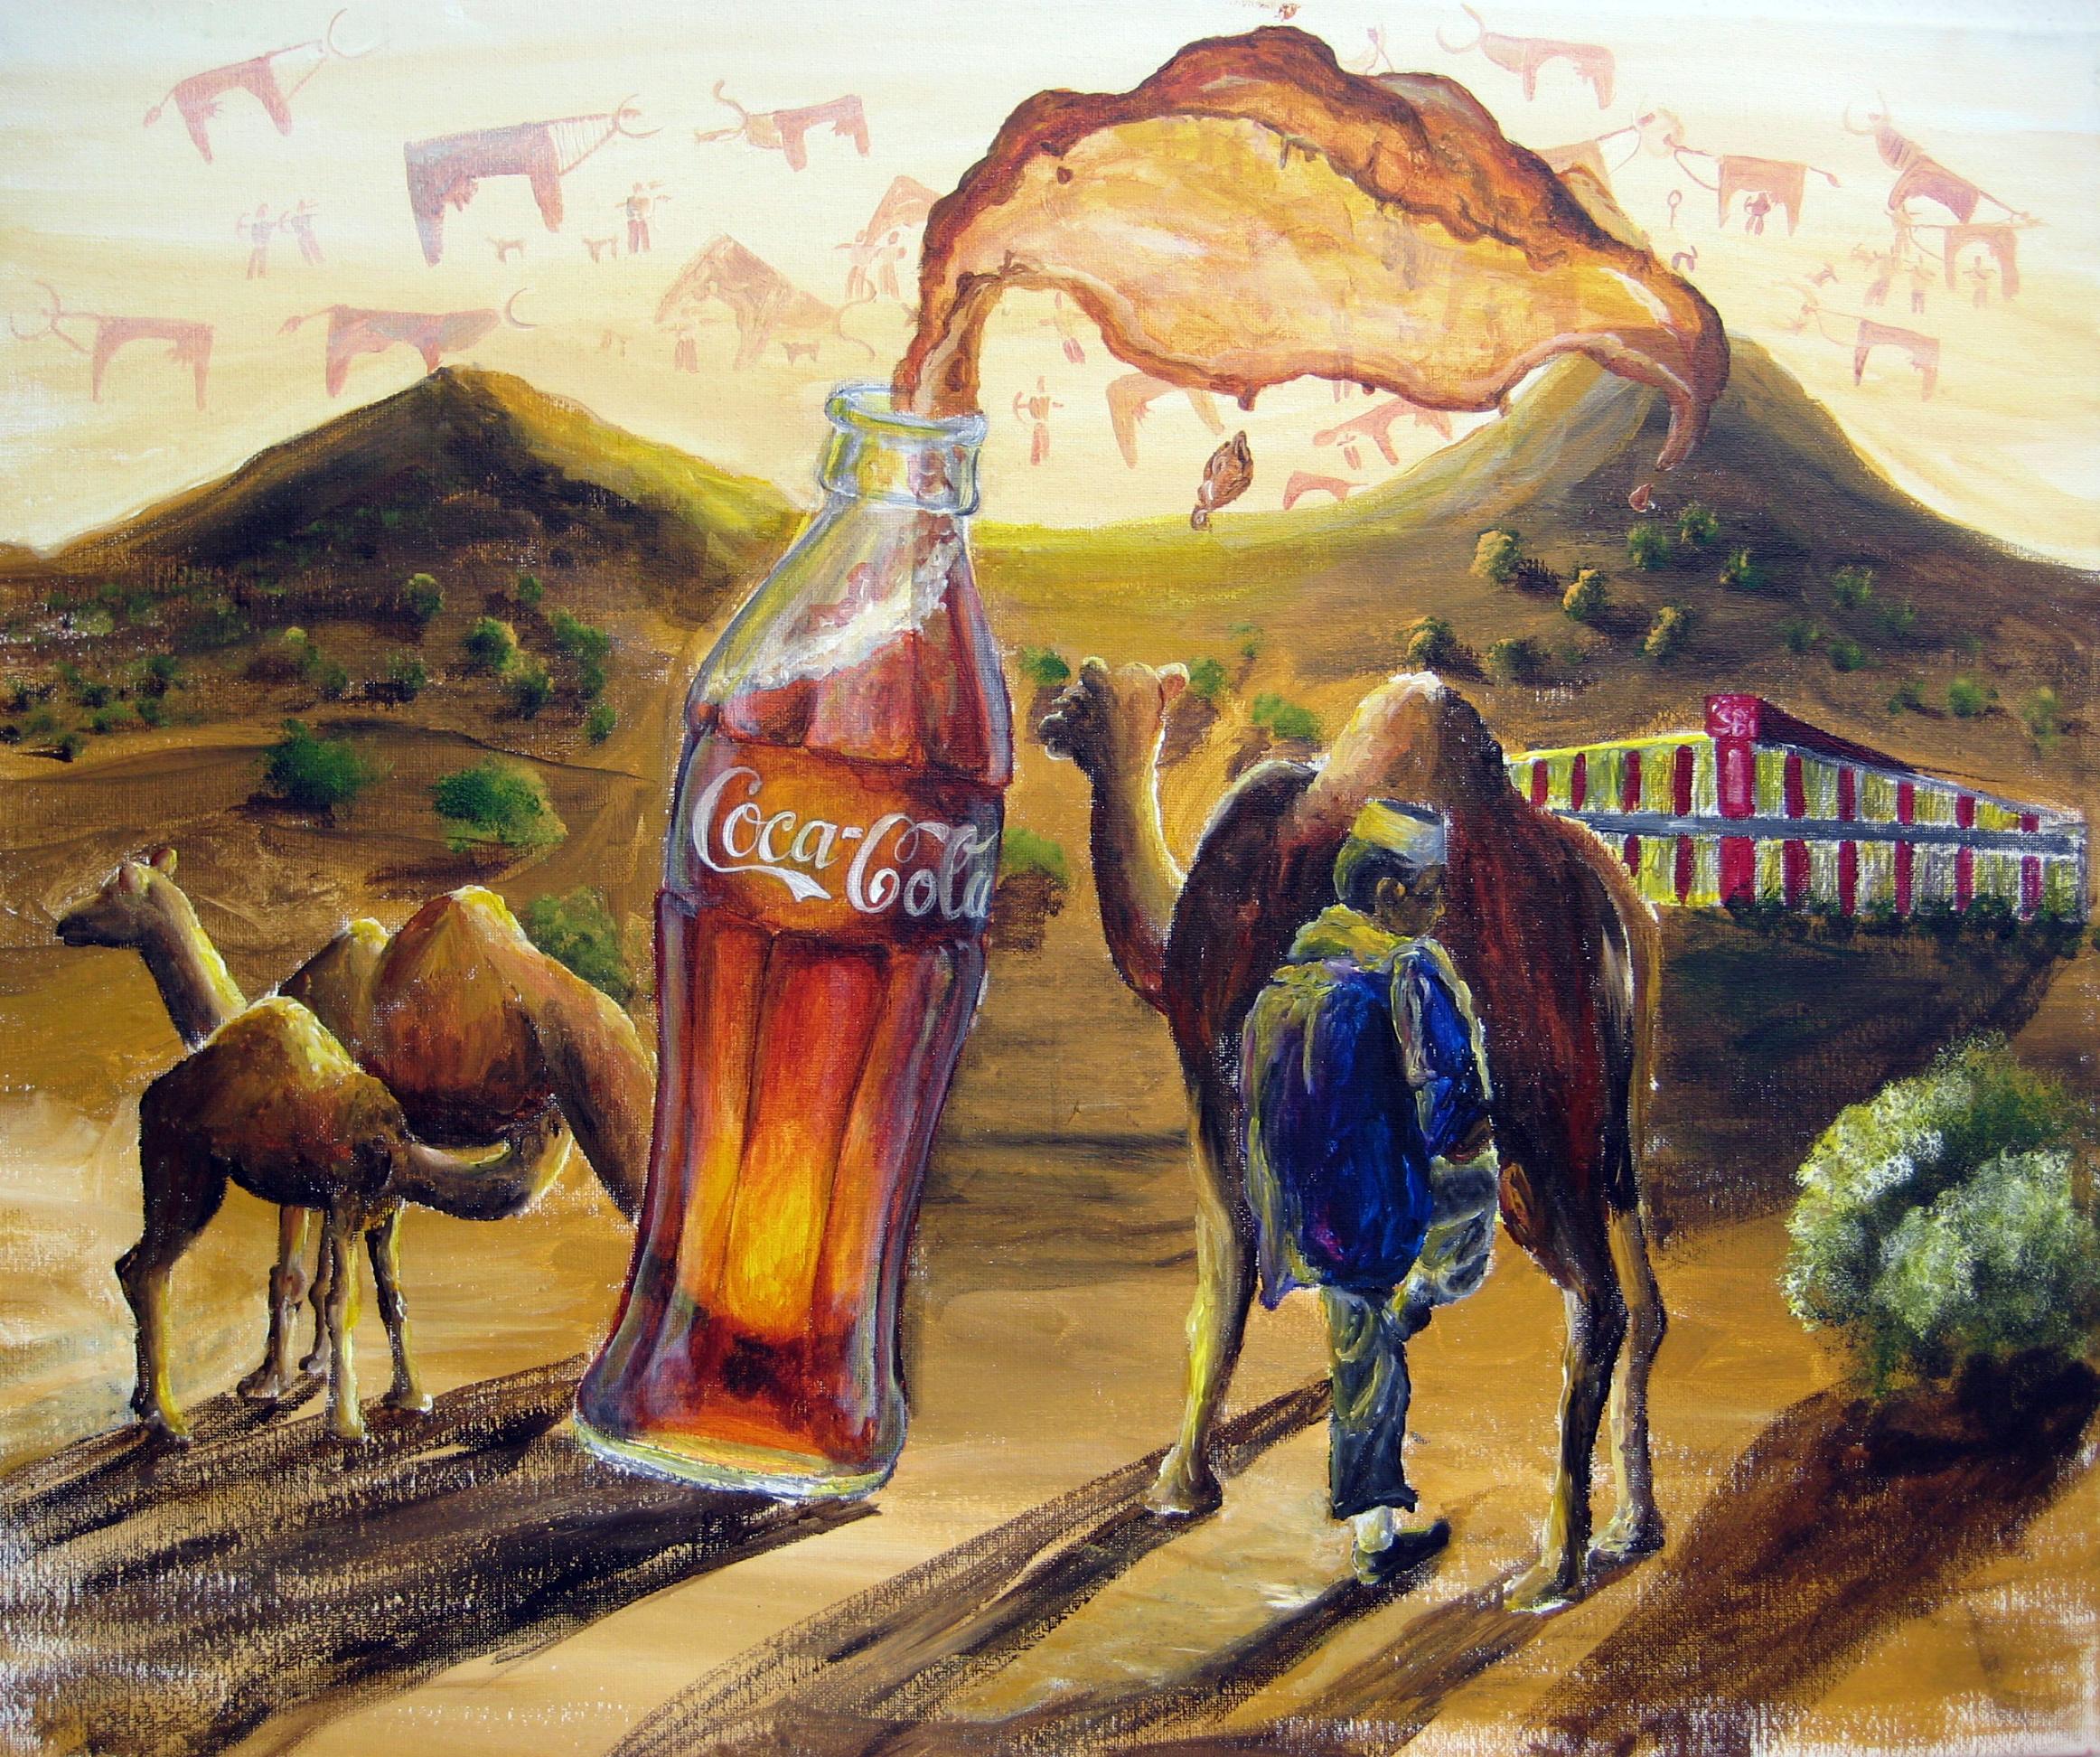 Coke dreams